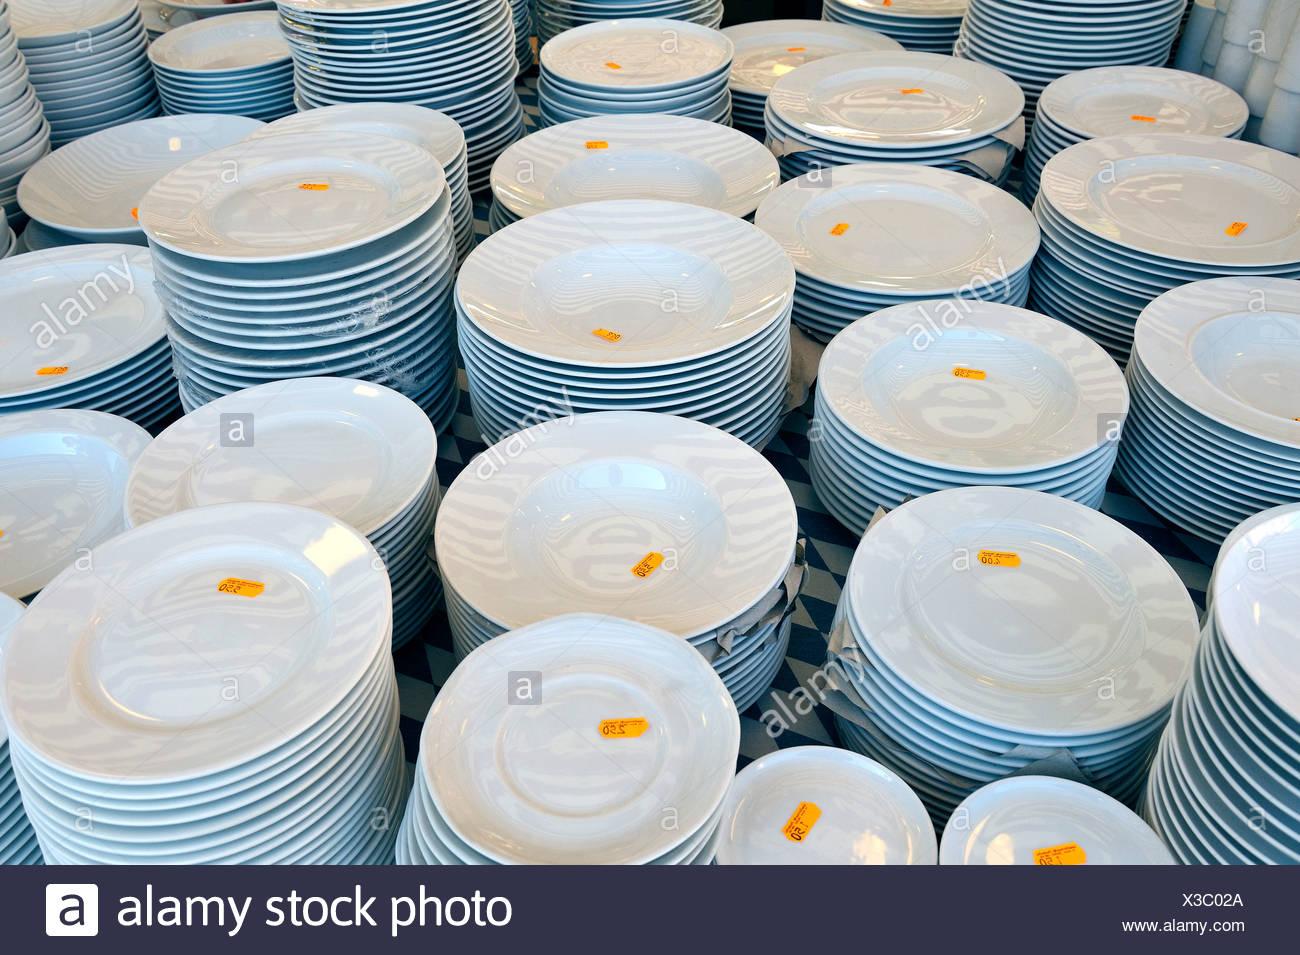 Stacks of white plates, Auer Dult market, Munich, Bavaria, Germany, Europe - Stock Image